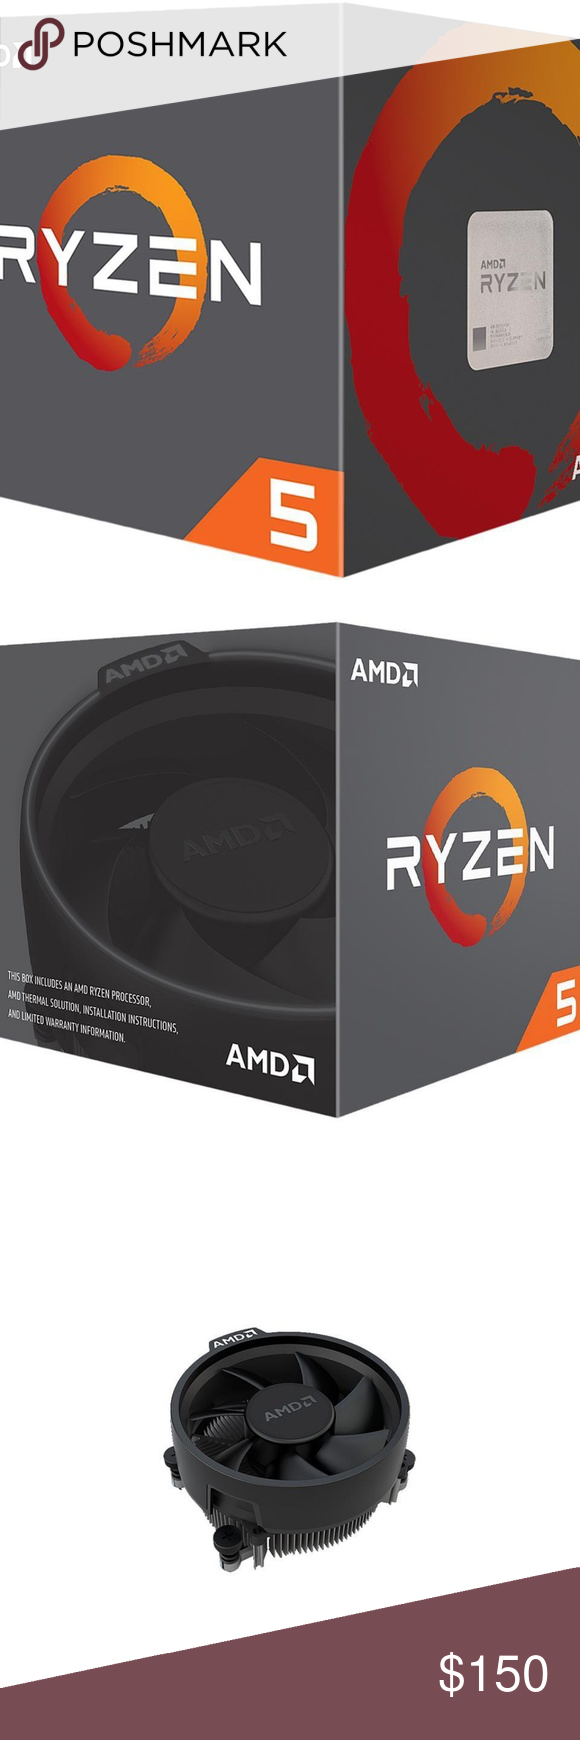 Amd Ryzen 5 2600 6 Core 3 4 Ghz Processor Amd Ryzen 5 2600 6 Core 3 4 Ghz 3 9 Ghz Max Boost Socket Am4 65w Yd2600bbafbox Desktop Processor Amd Processor Ddr4